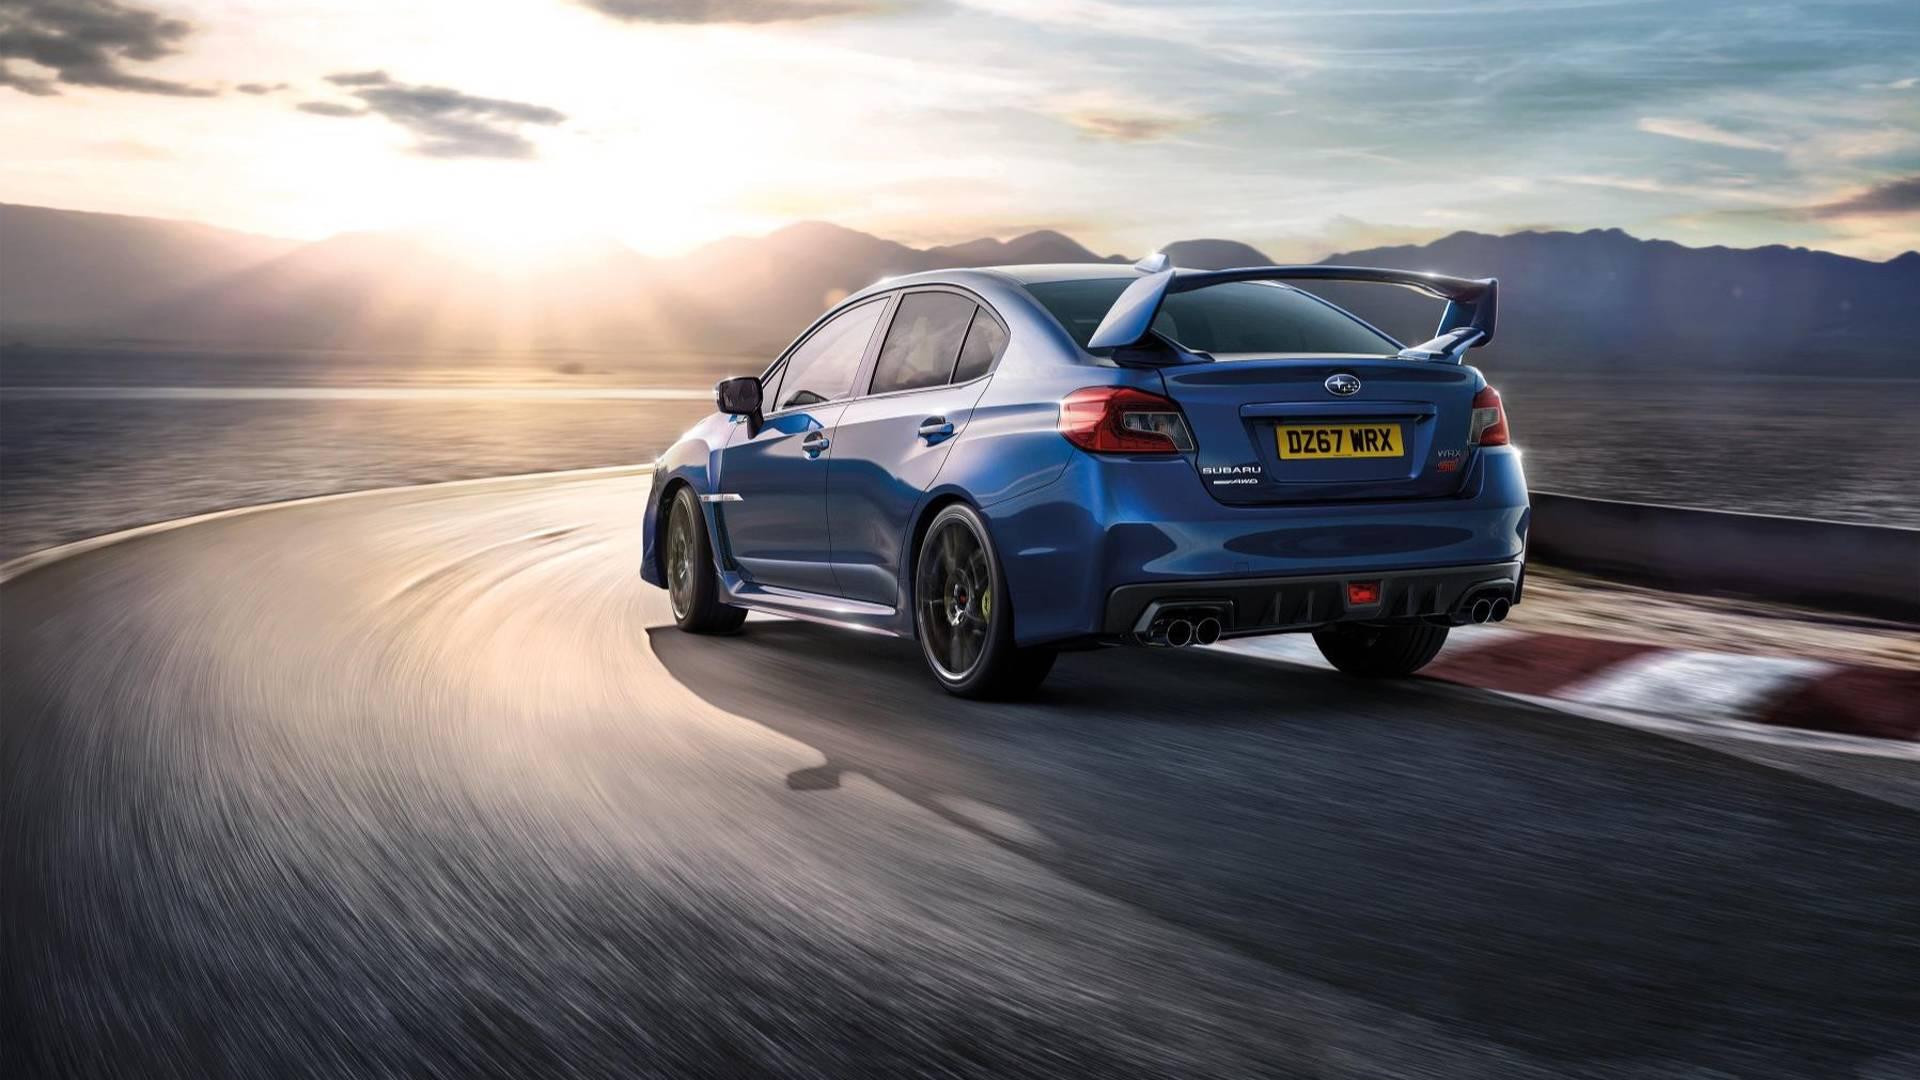 Cool Modified Cars Wallpapers 2018 Subaru Impreza Wrx Sti Rendered As A Hatchback